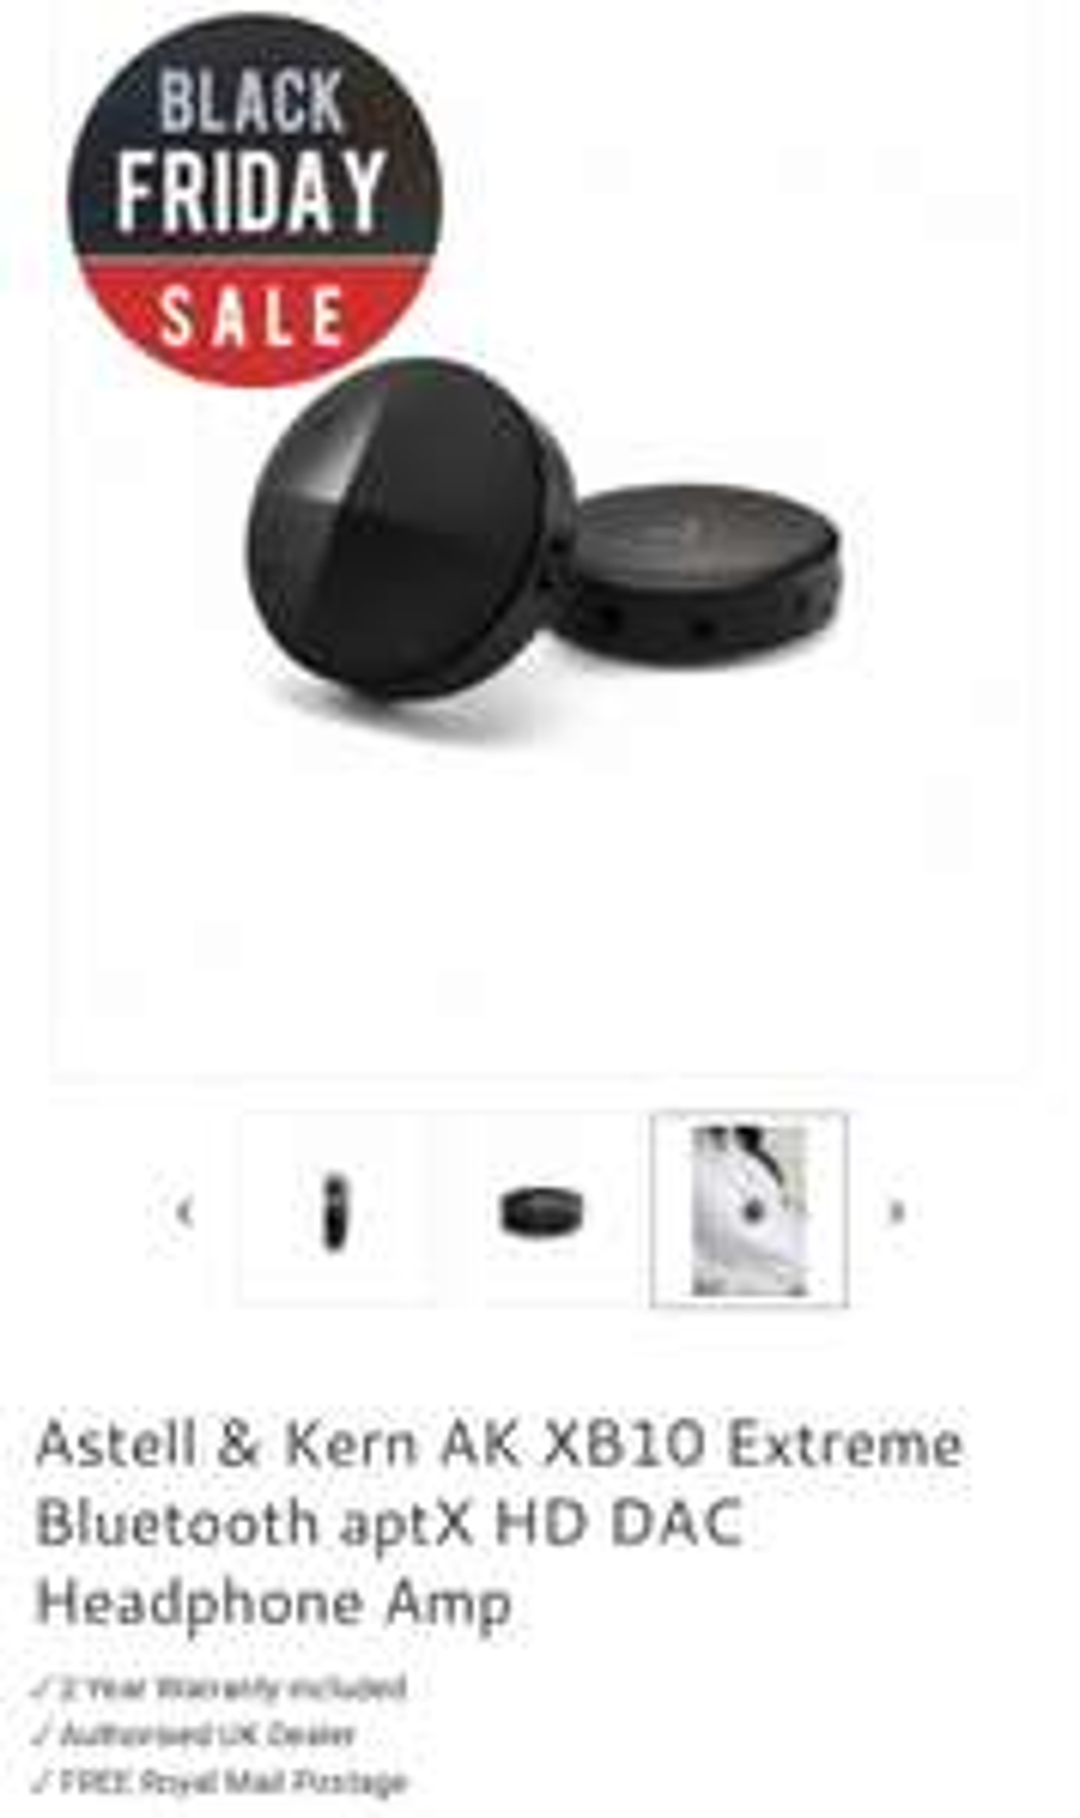 Astell & Kern AK XB10 Extreme Bluetooth aptX HD DAC Headphone Amp £89 40%off at Home AV Direct